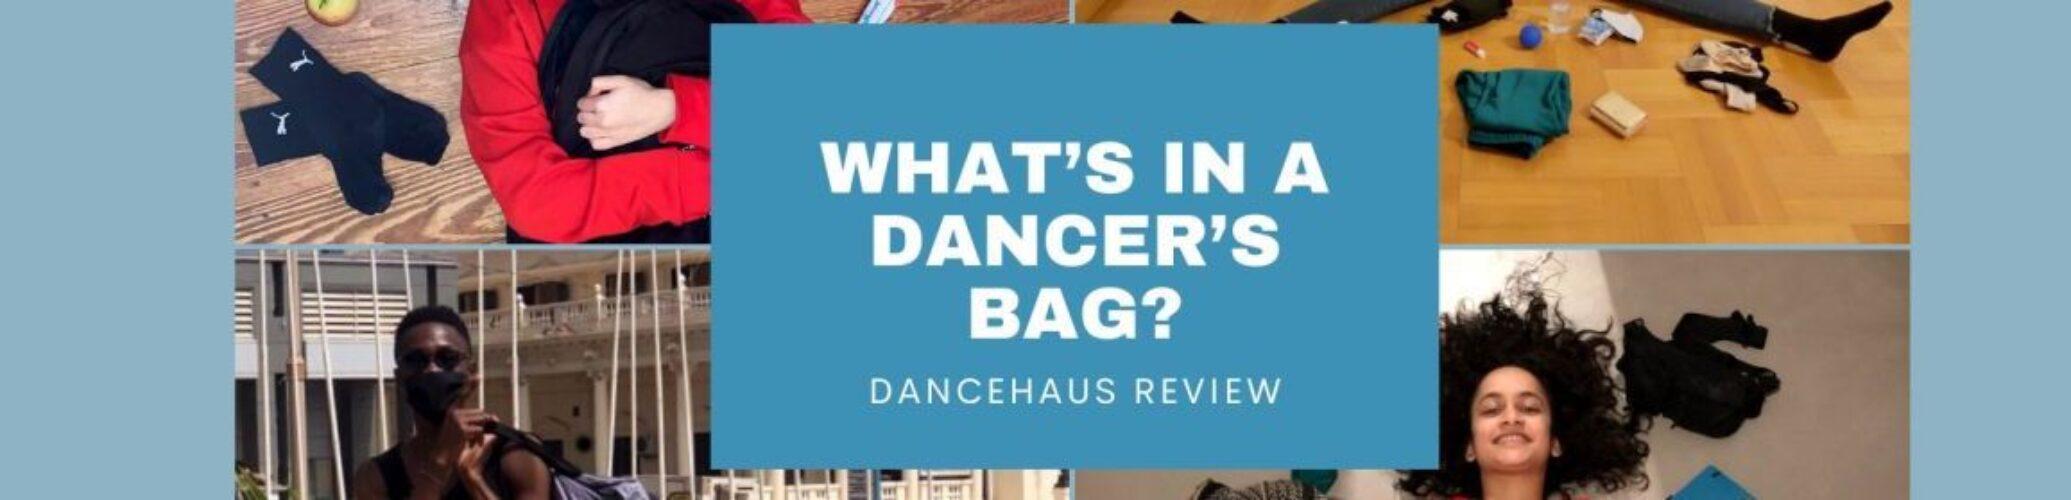 Dancers Bag - DanceHaus Blog - EurAsia view